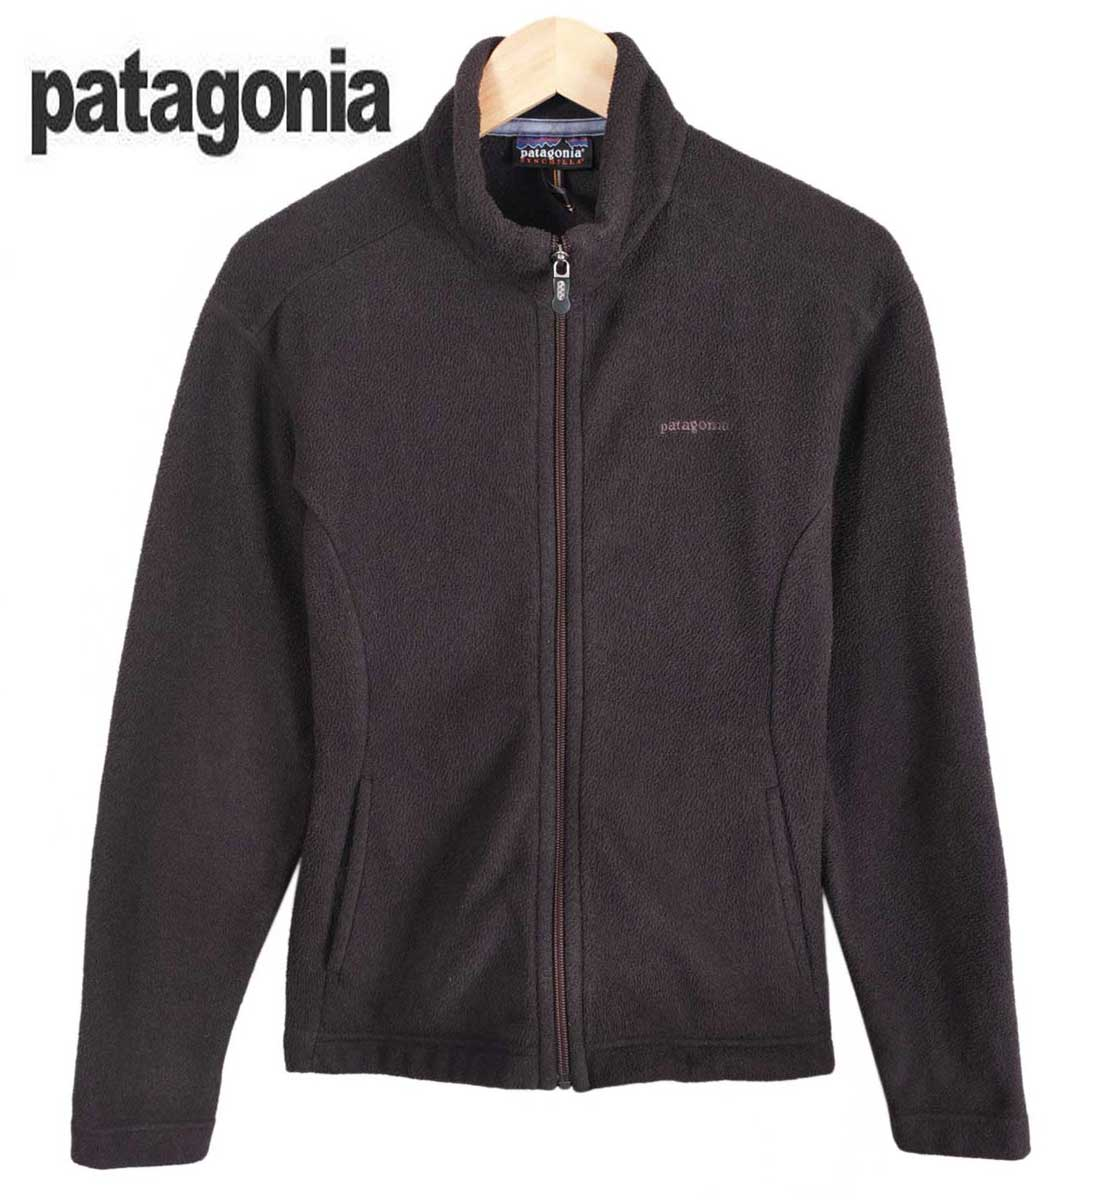 5b75f7c91883 Patagonia Patagonia   thin Chinchilla full zip fleece jacket   dark brown   ladies  M equivalent to 1